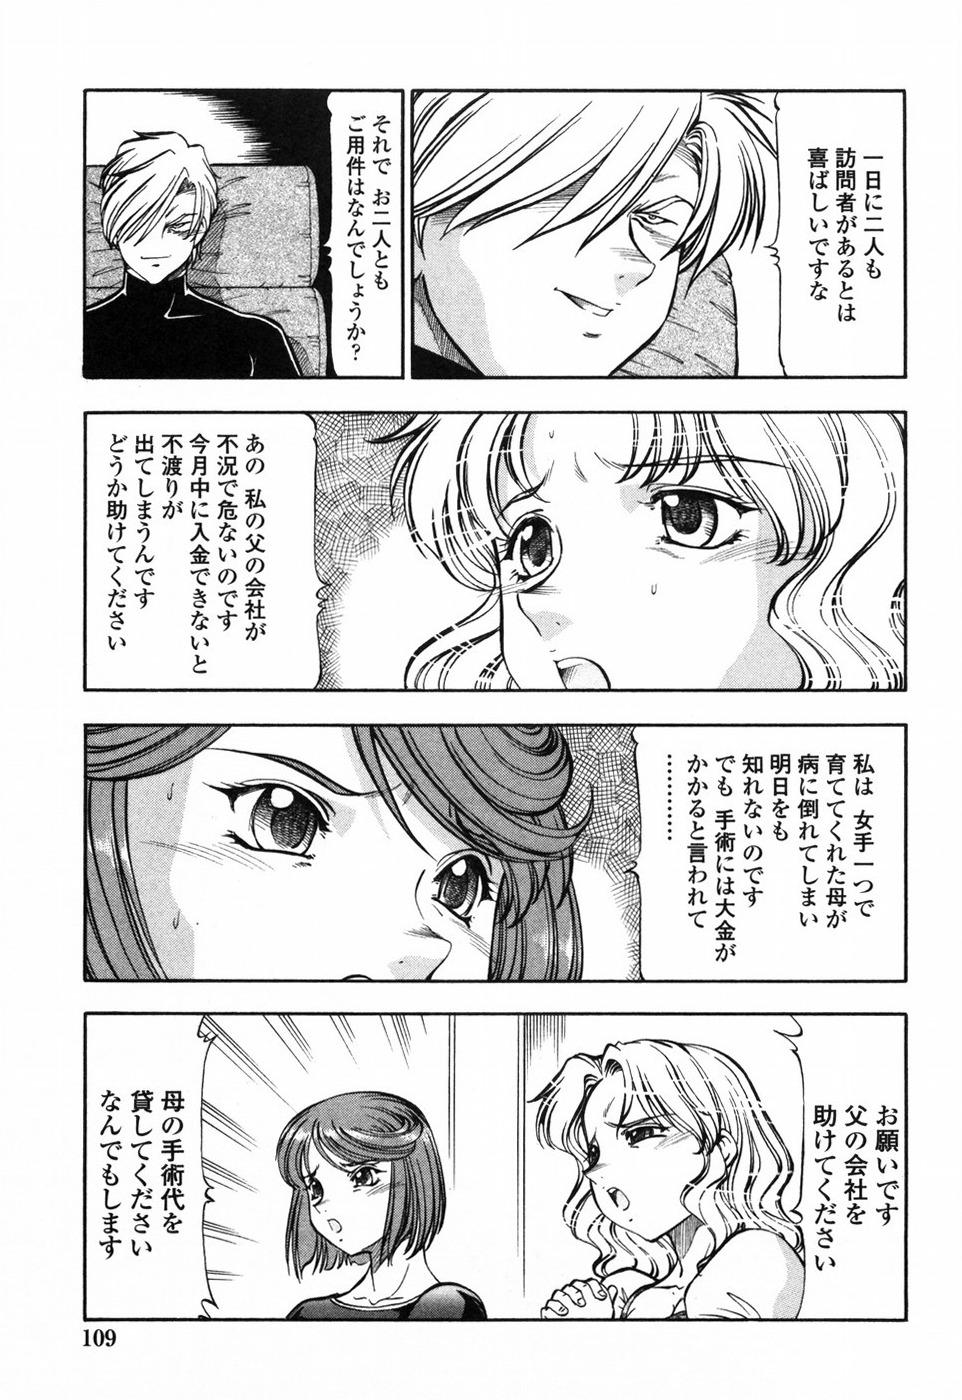 Kichiku Houteishiki - Equation of brutal person 115